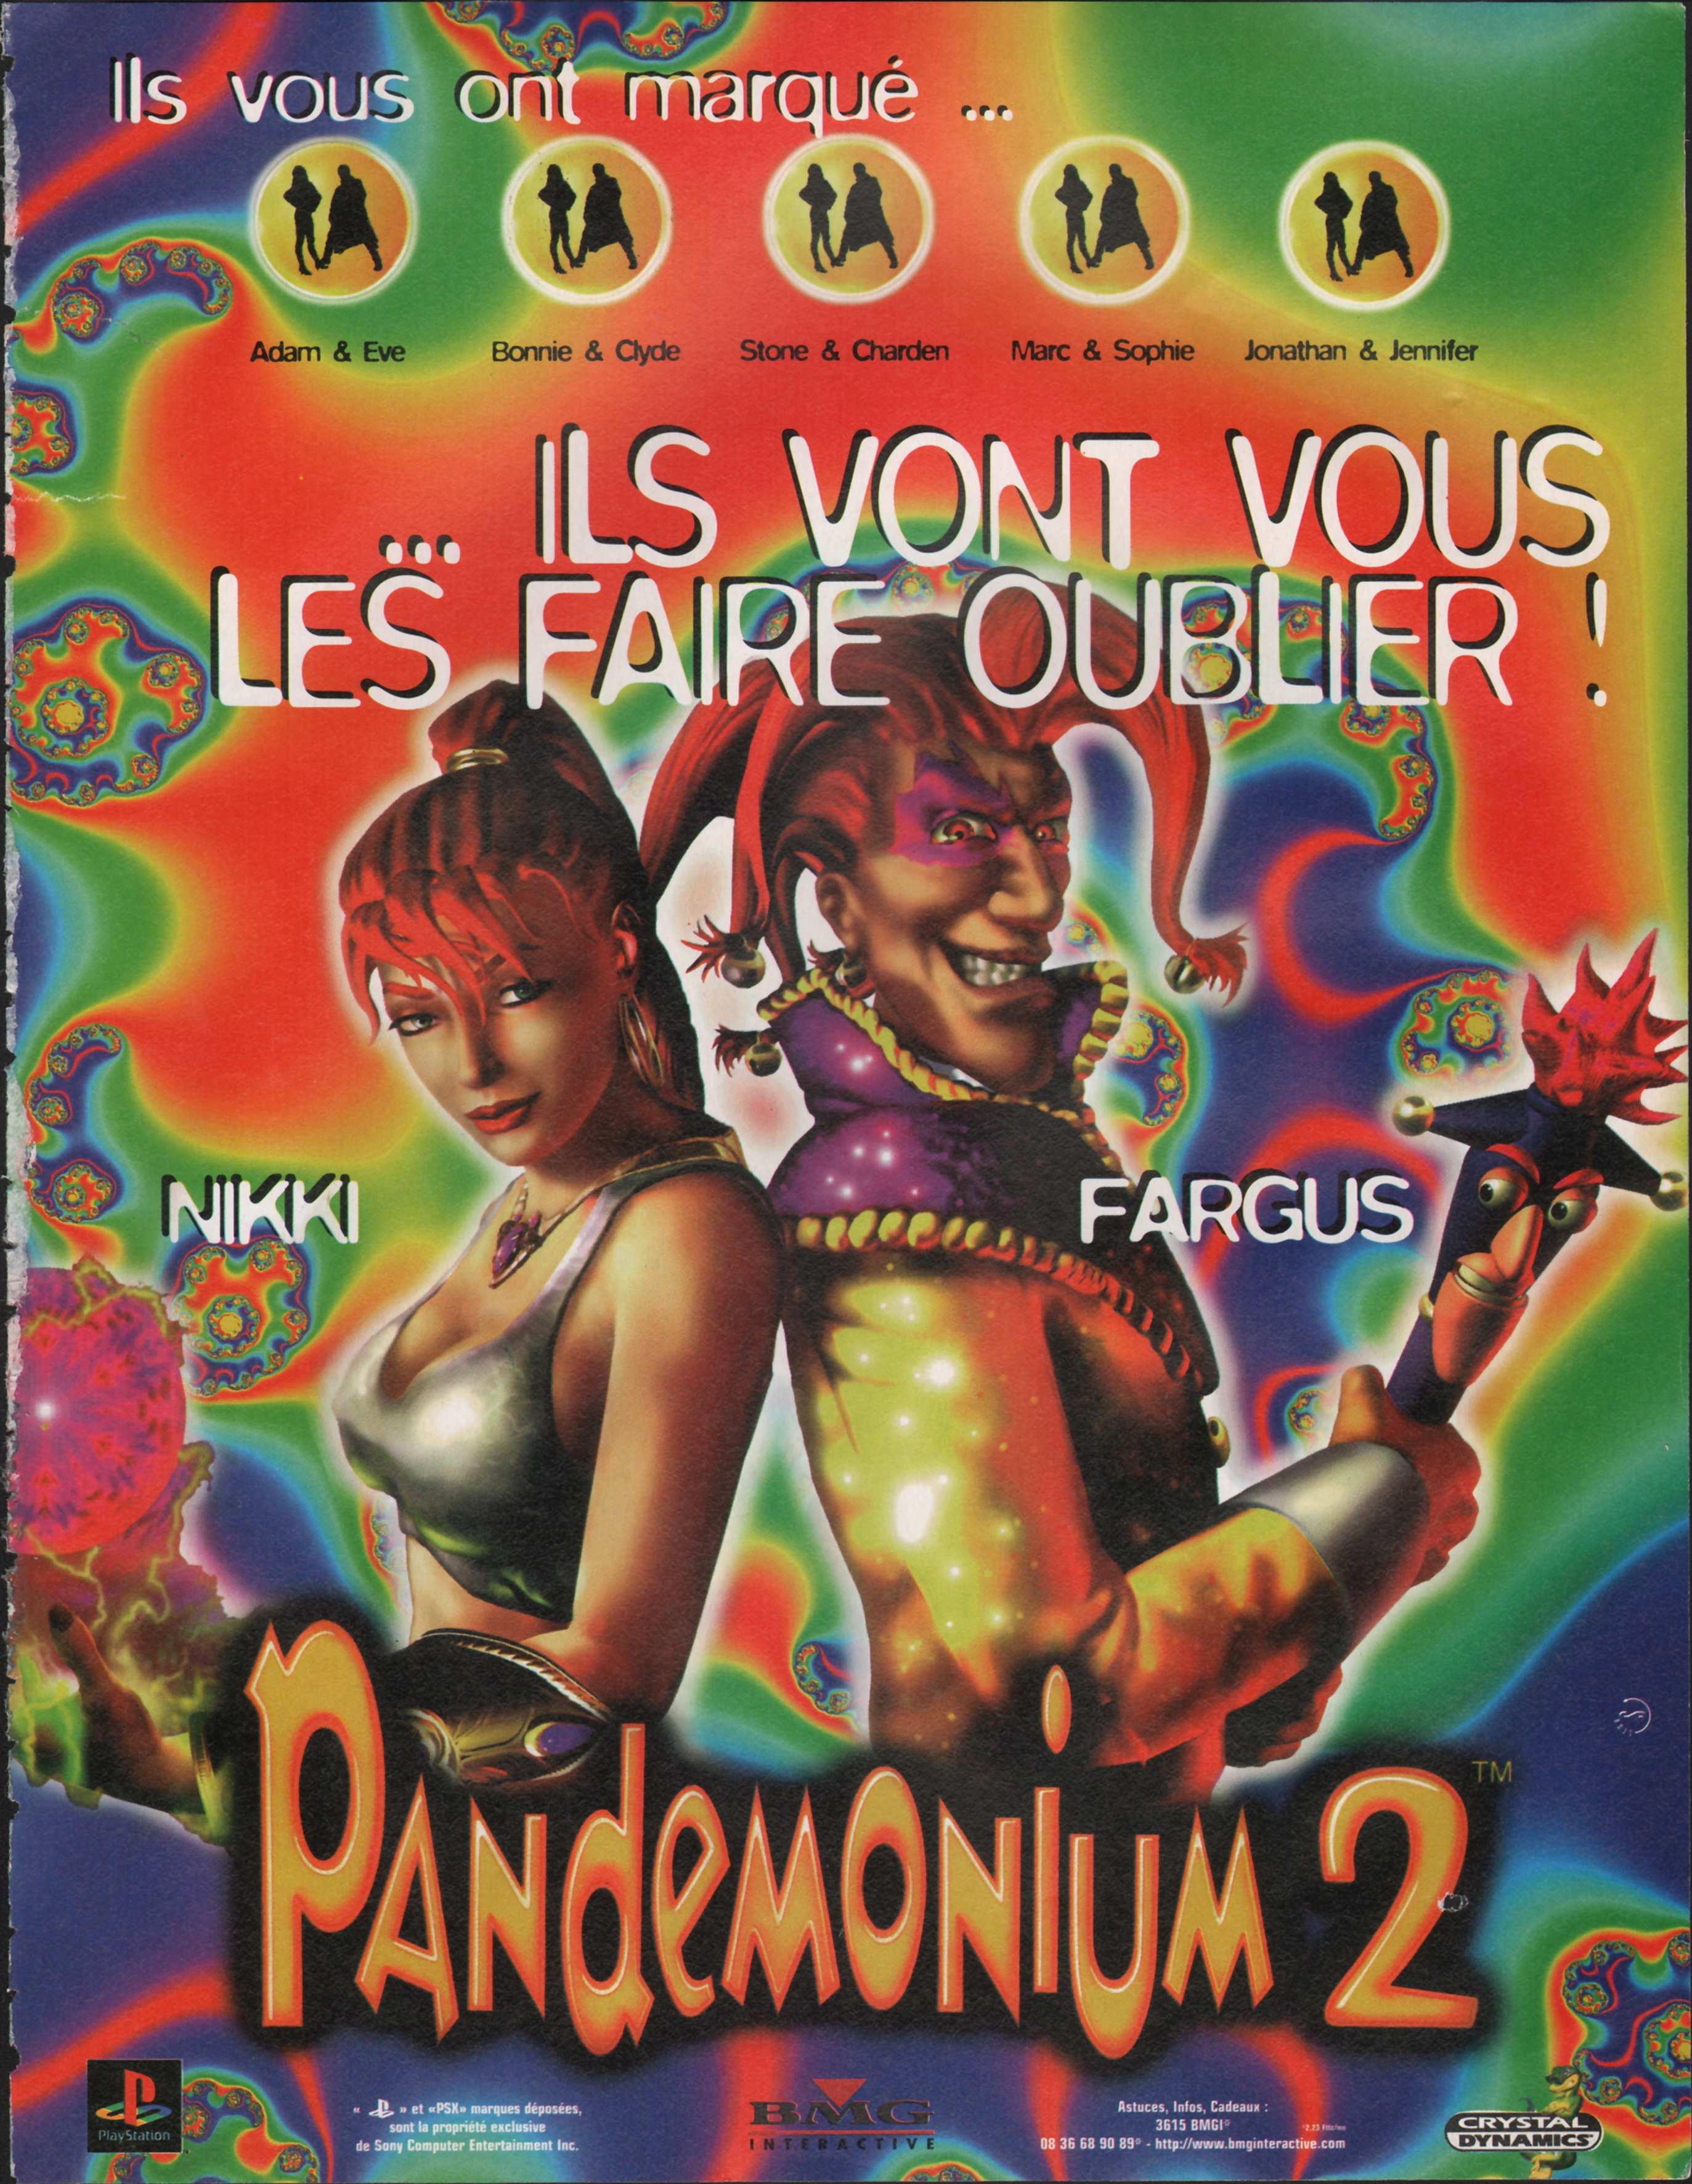 Pandemonium 2 Playstation%20Magazine%20016%20-%20Page%20005%20(1998-01)